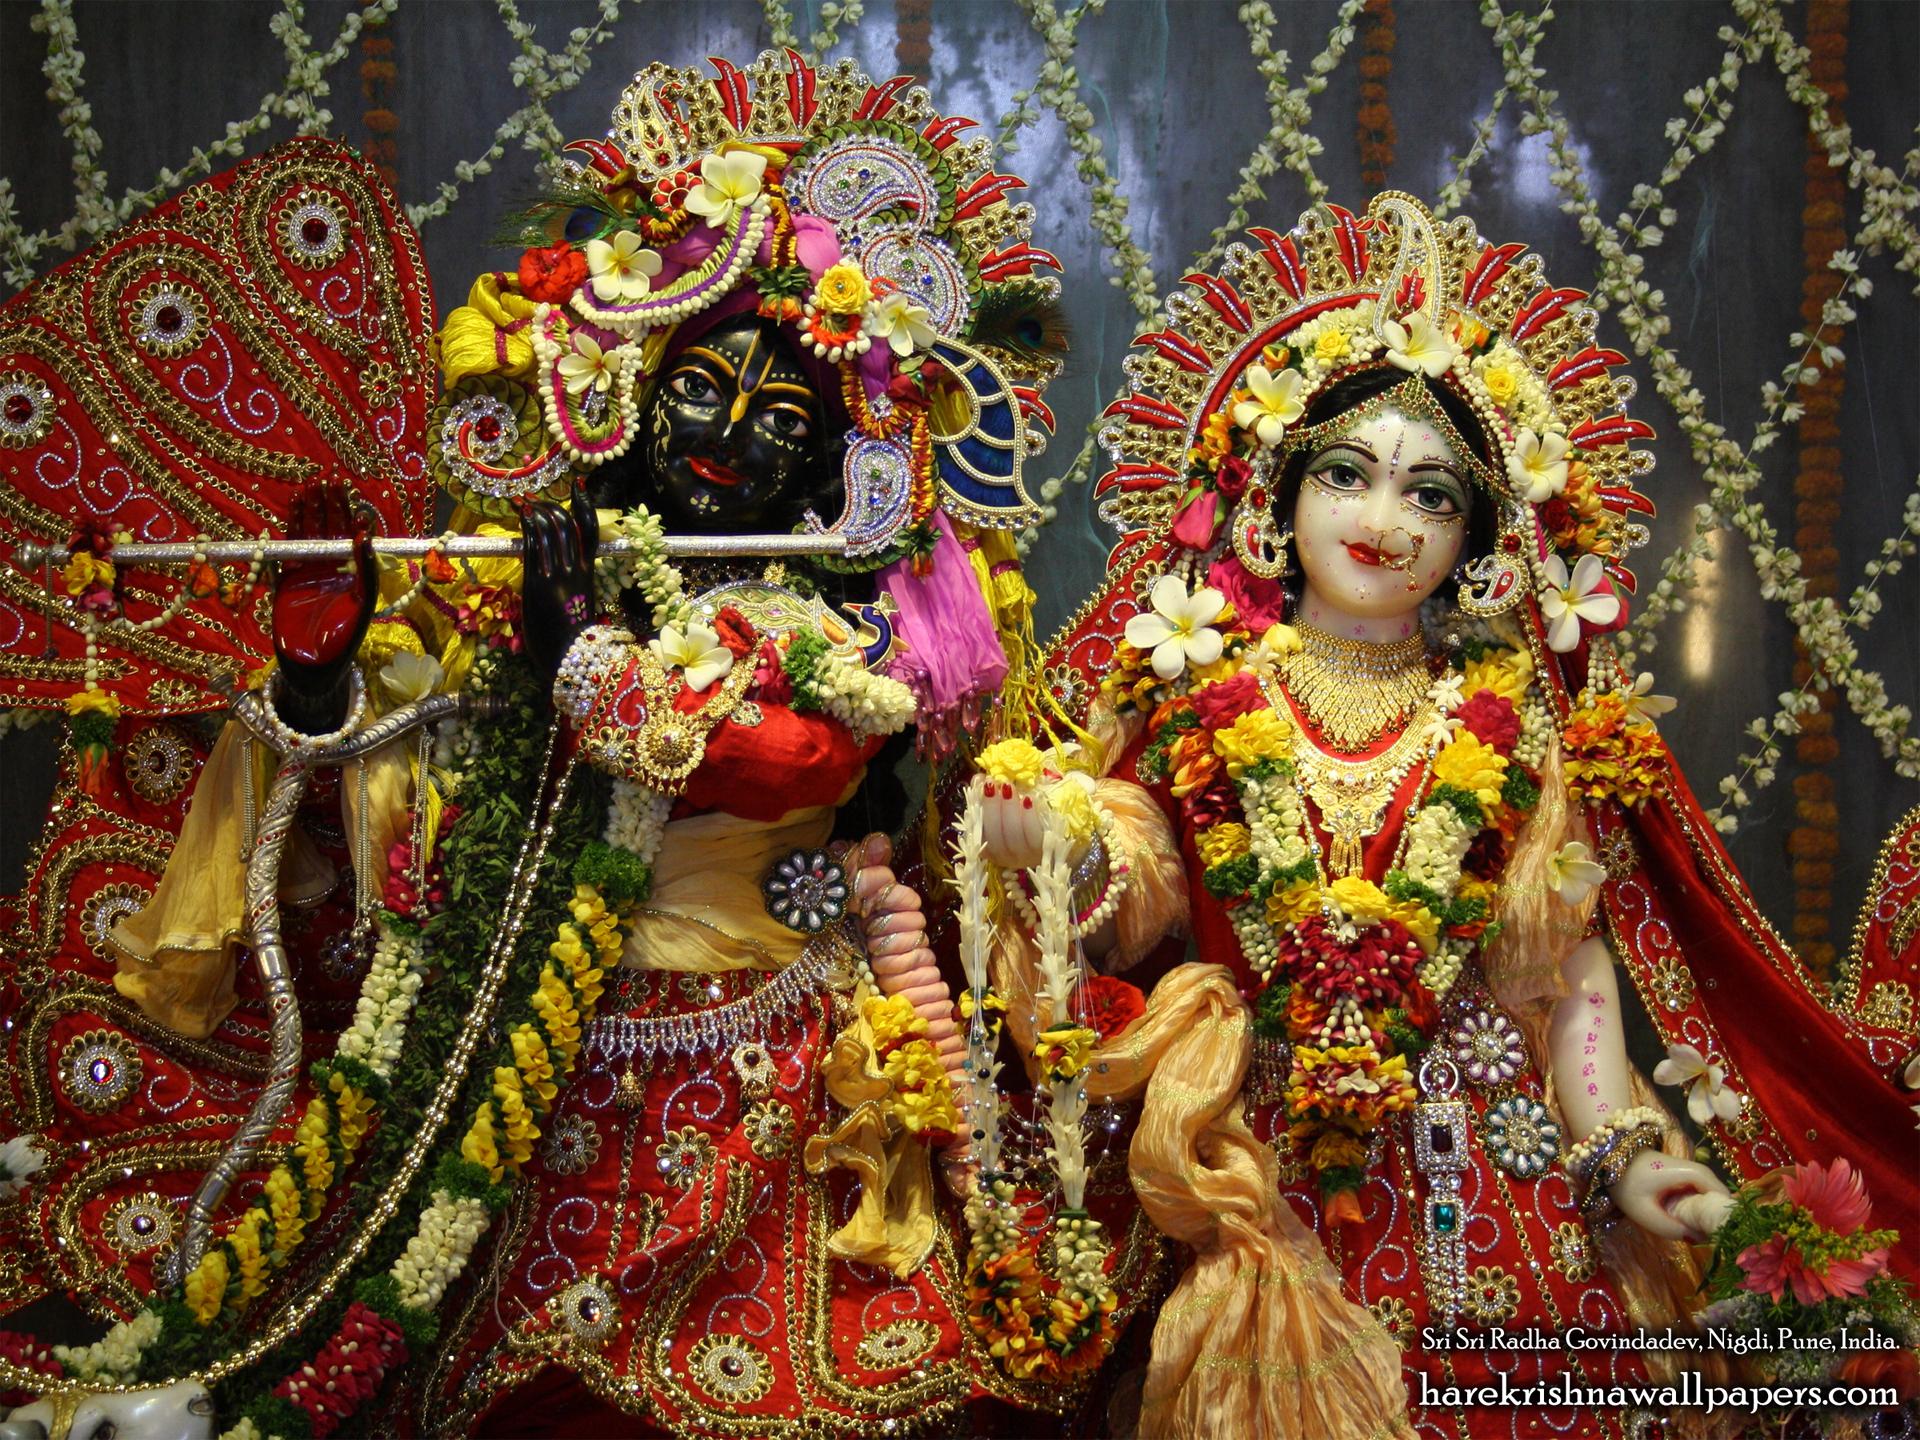 Sri Sri Radha Govind Close up Wallpaper (003) Size 1920x1440 Download